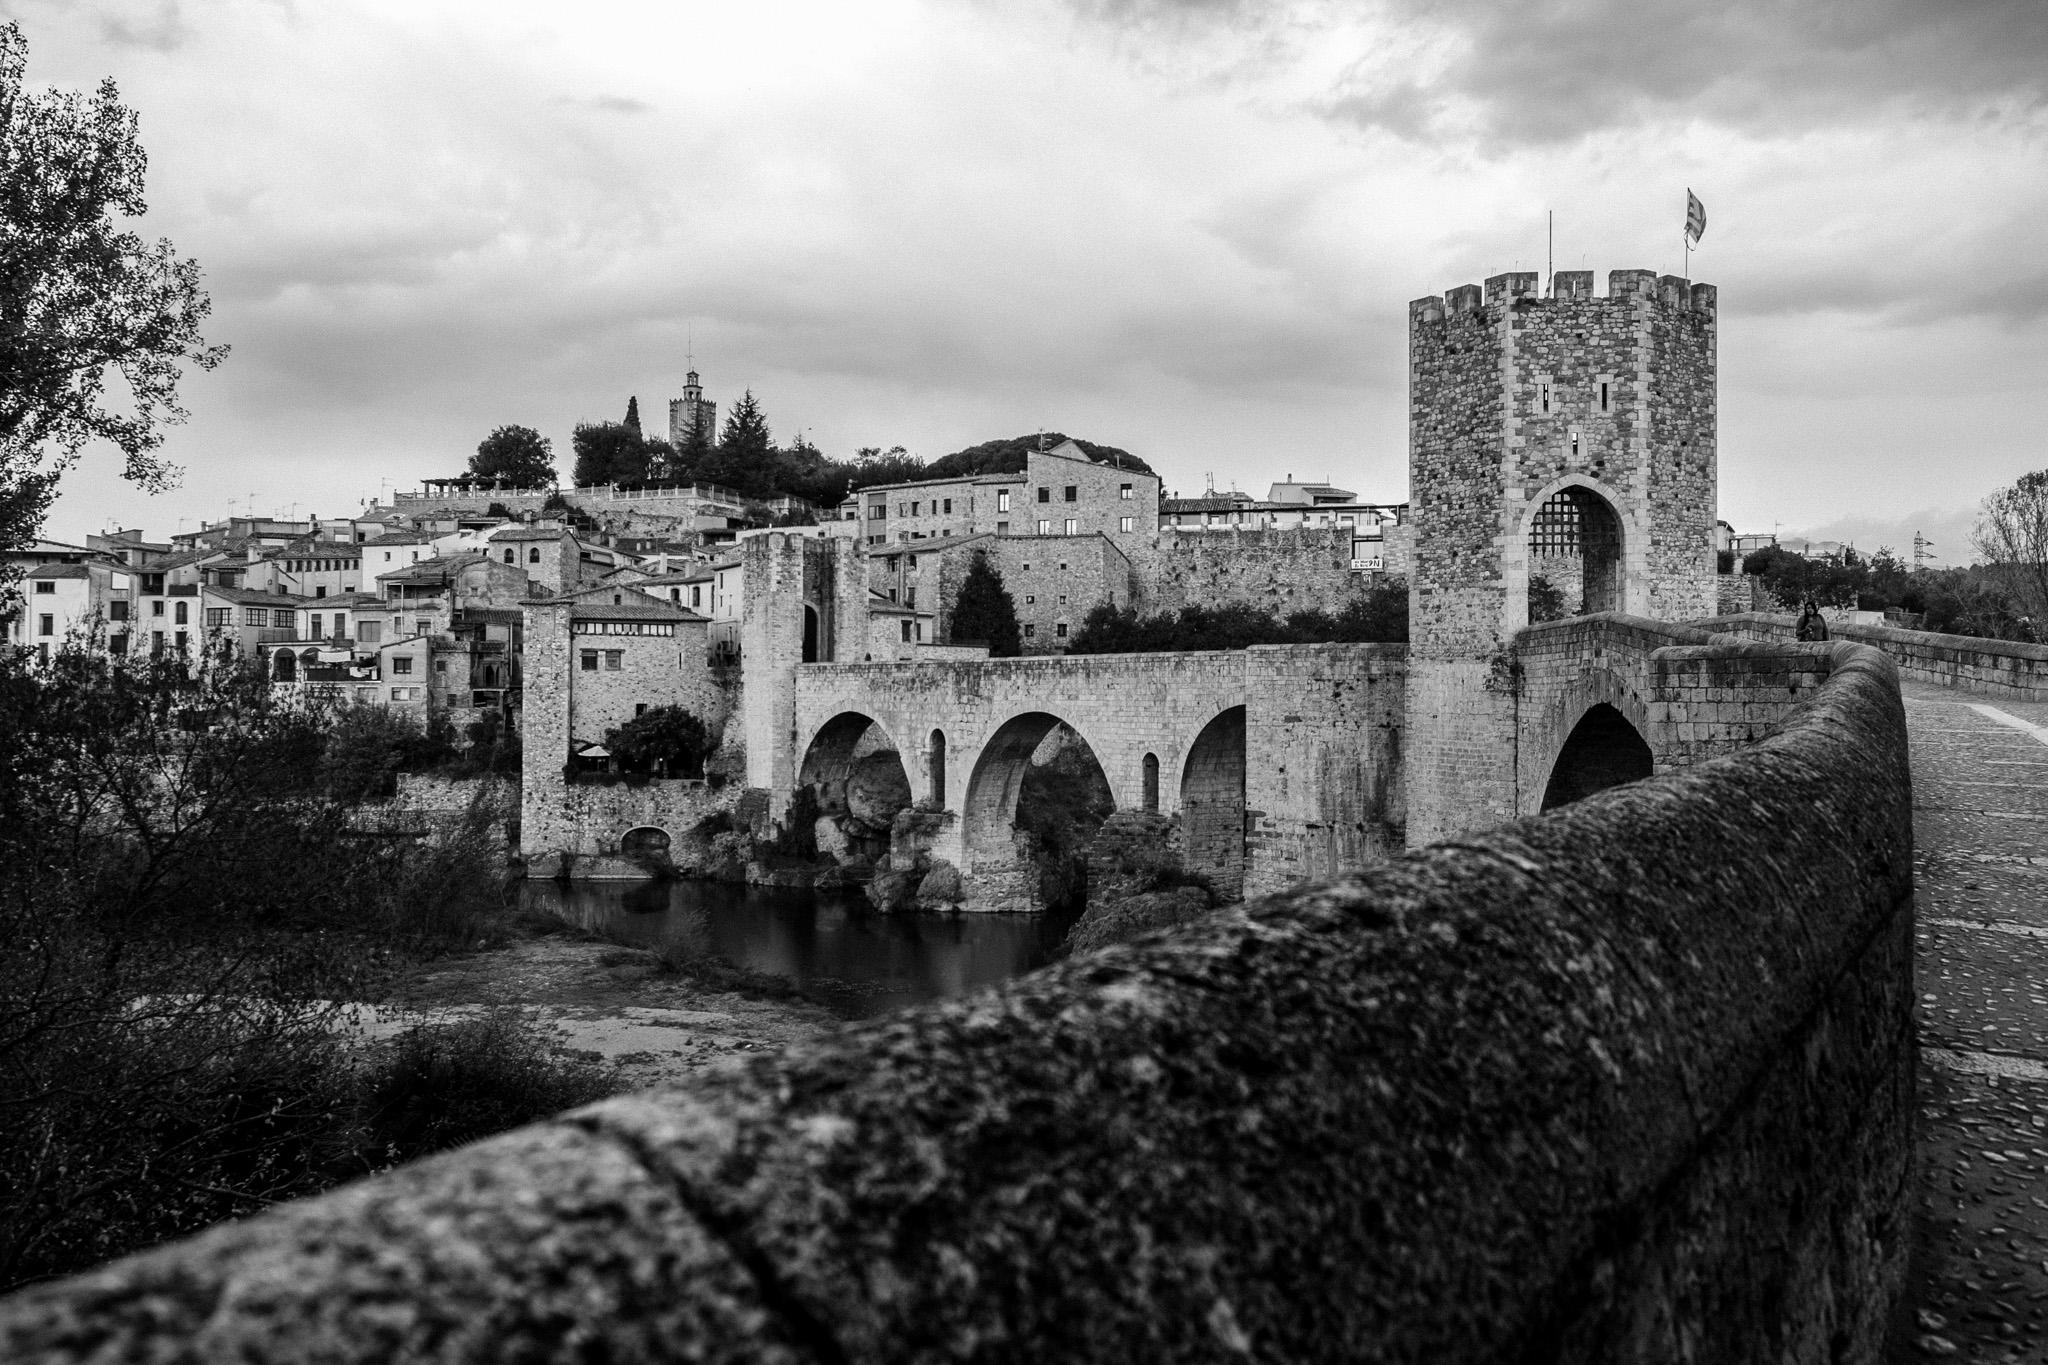 The medieval town of Besalú in Girona, Catalonia.